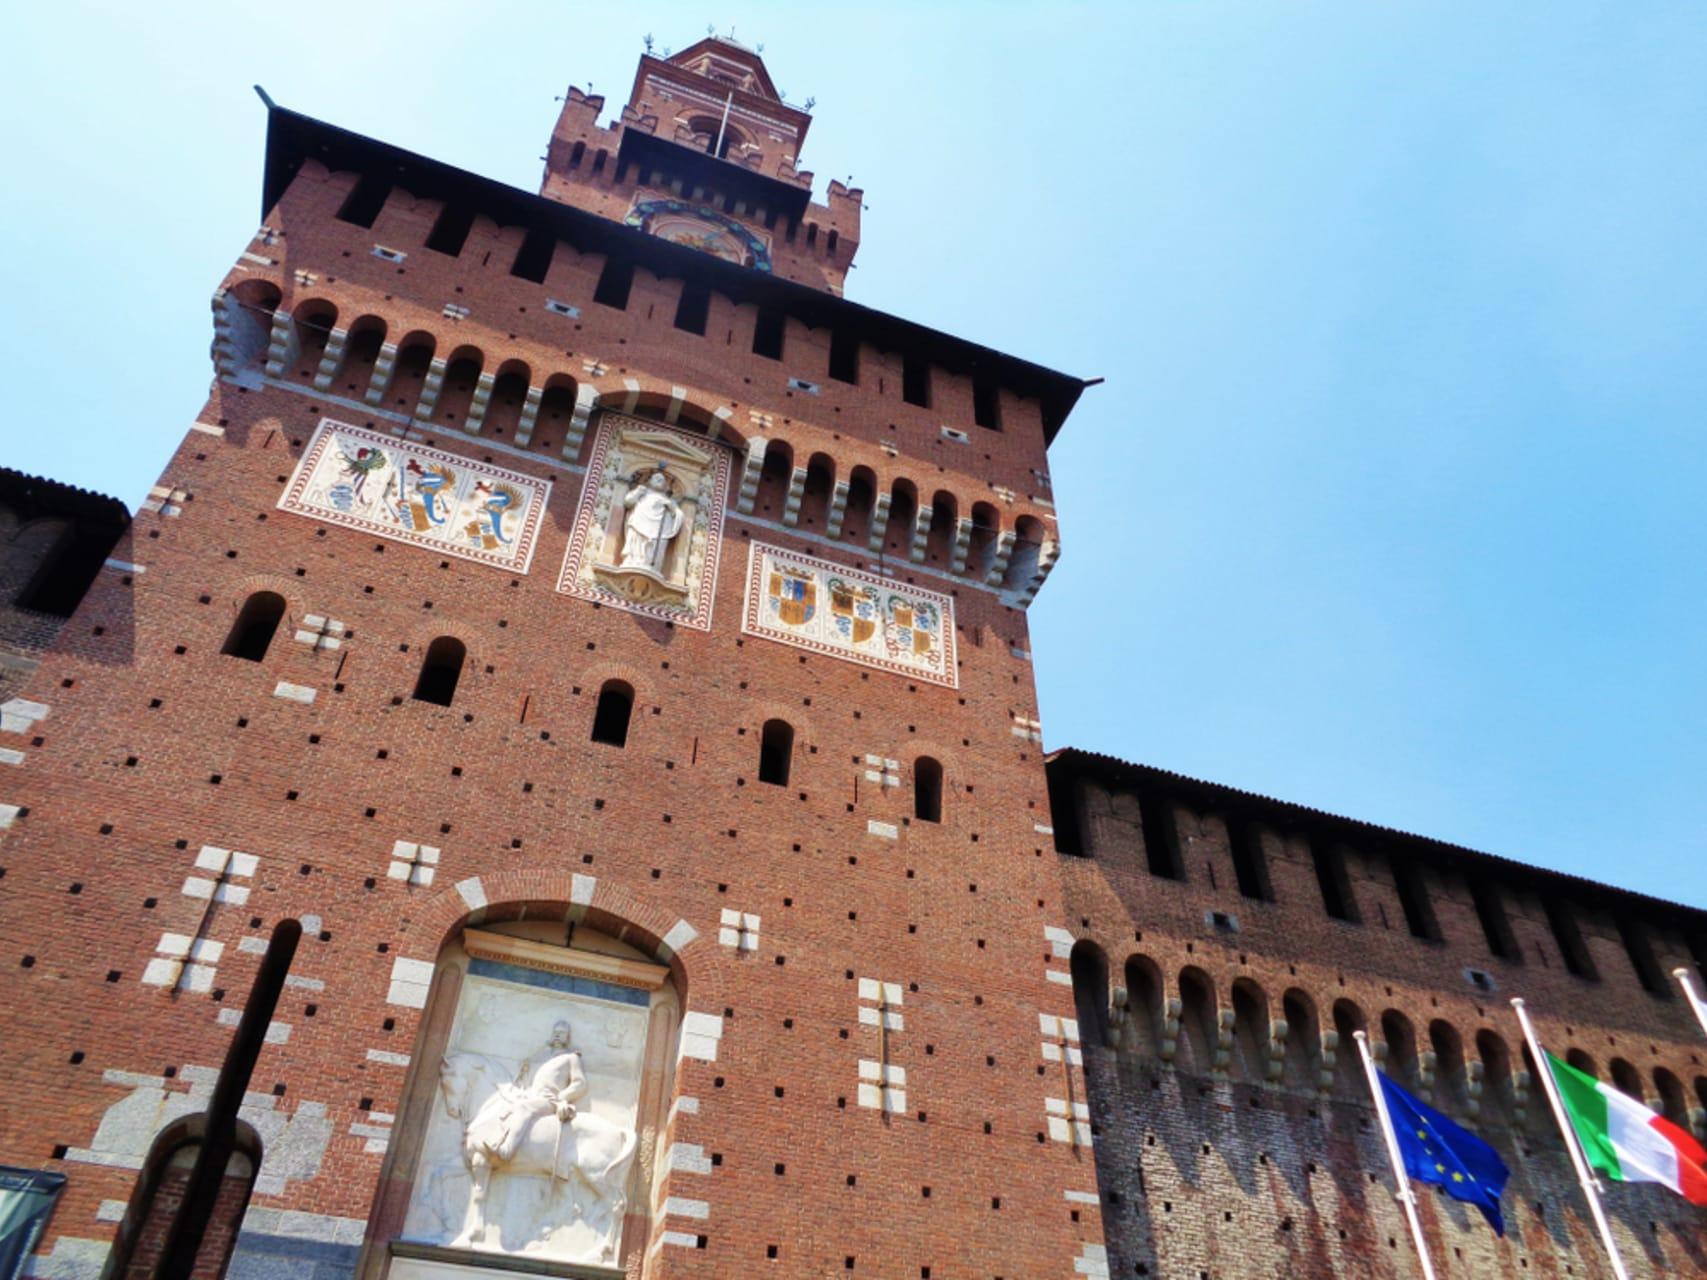 Milan - Milan - Part 2: Castle Tour